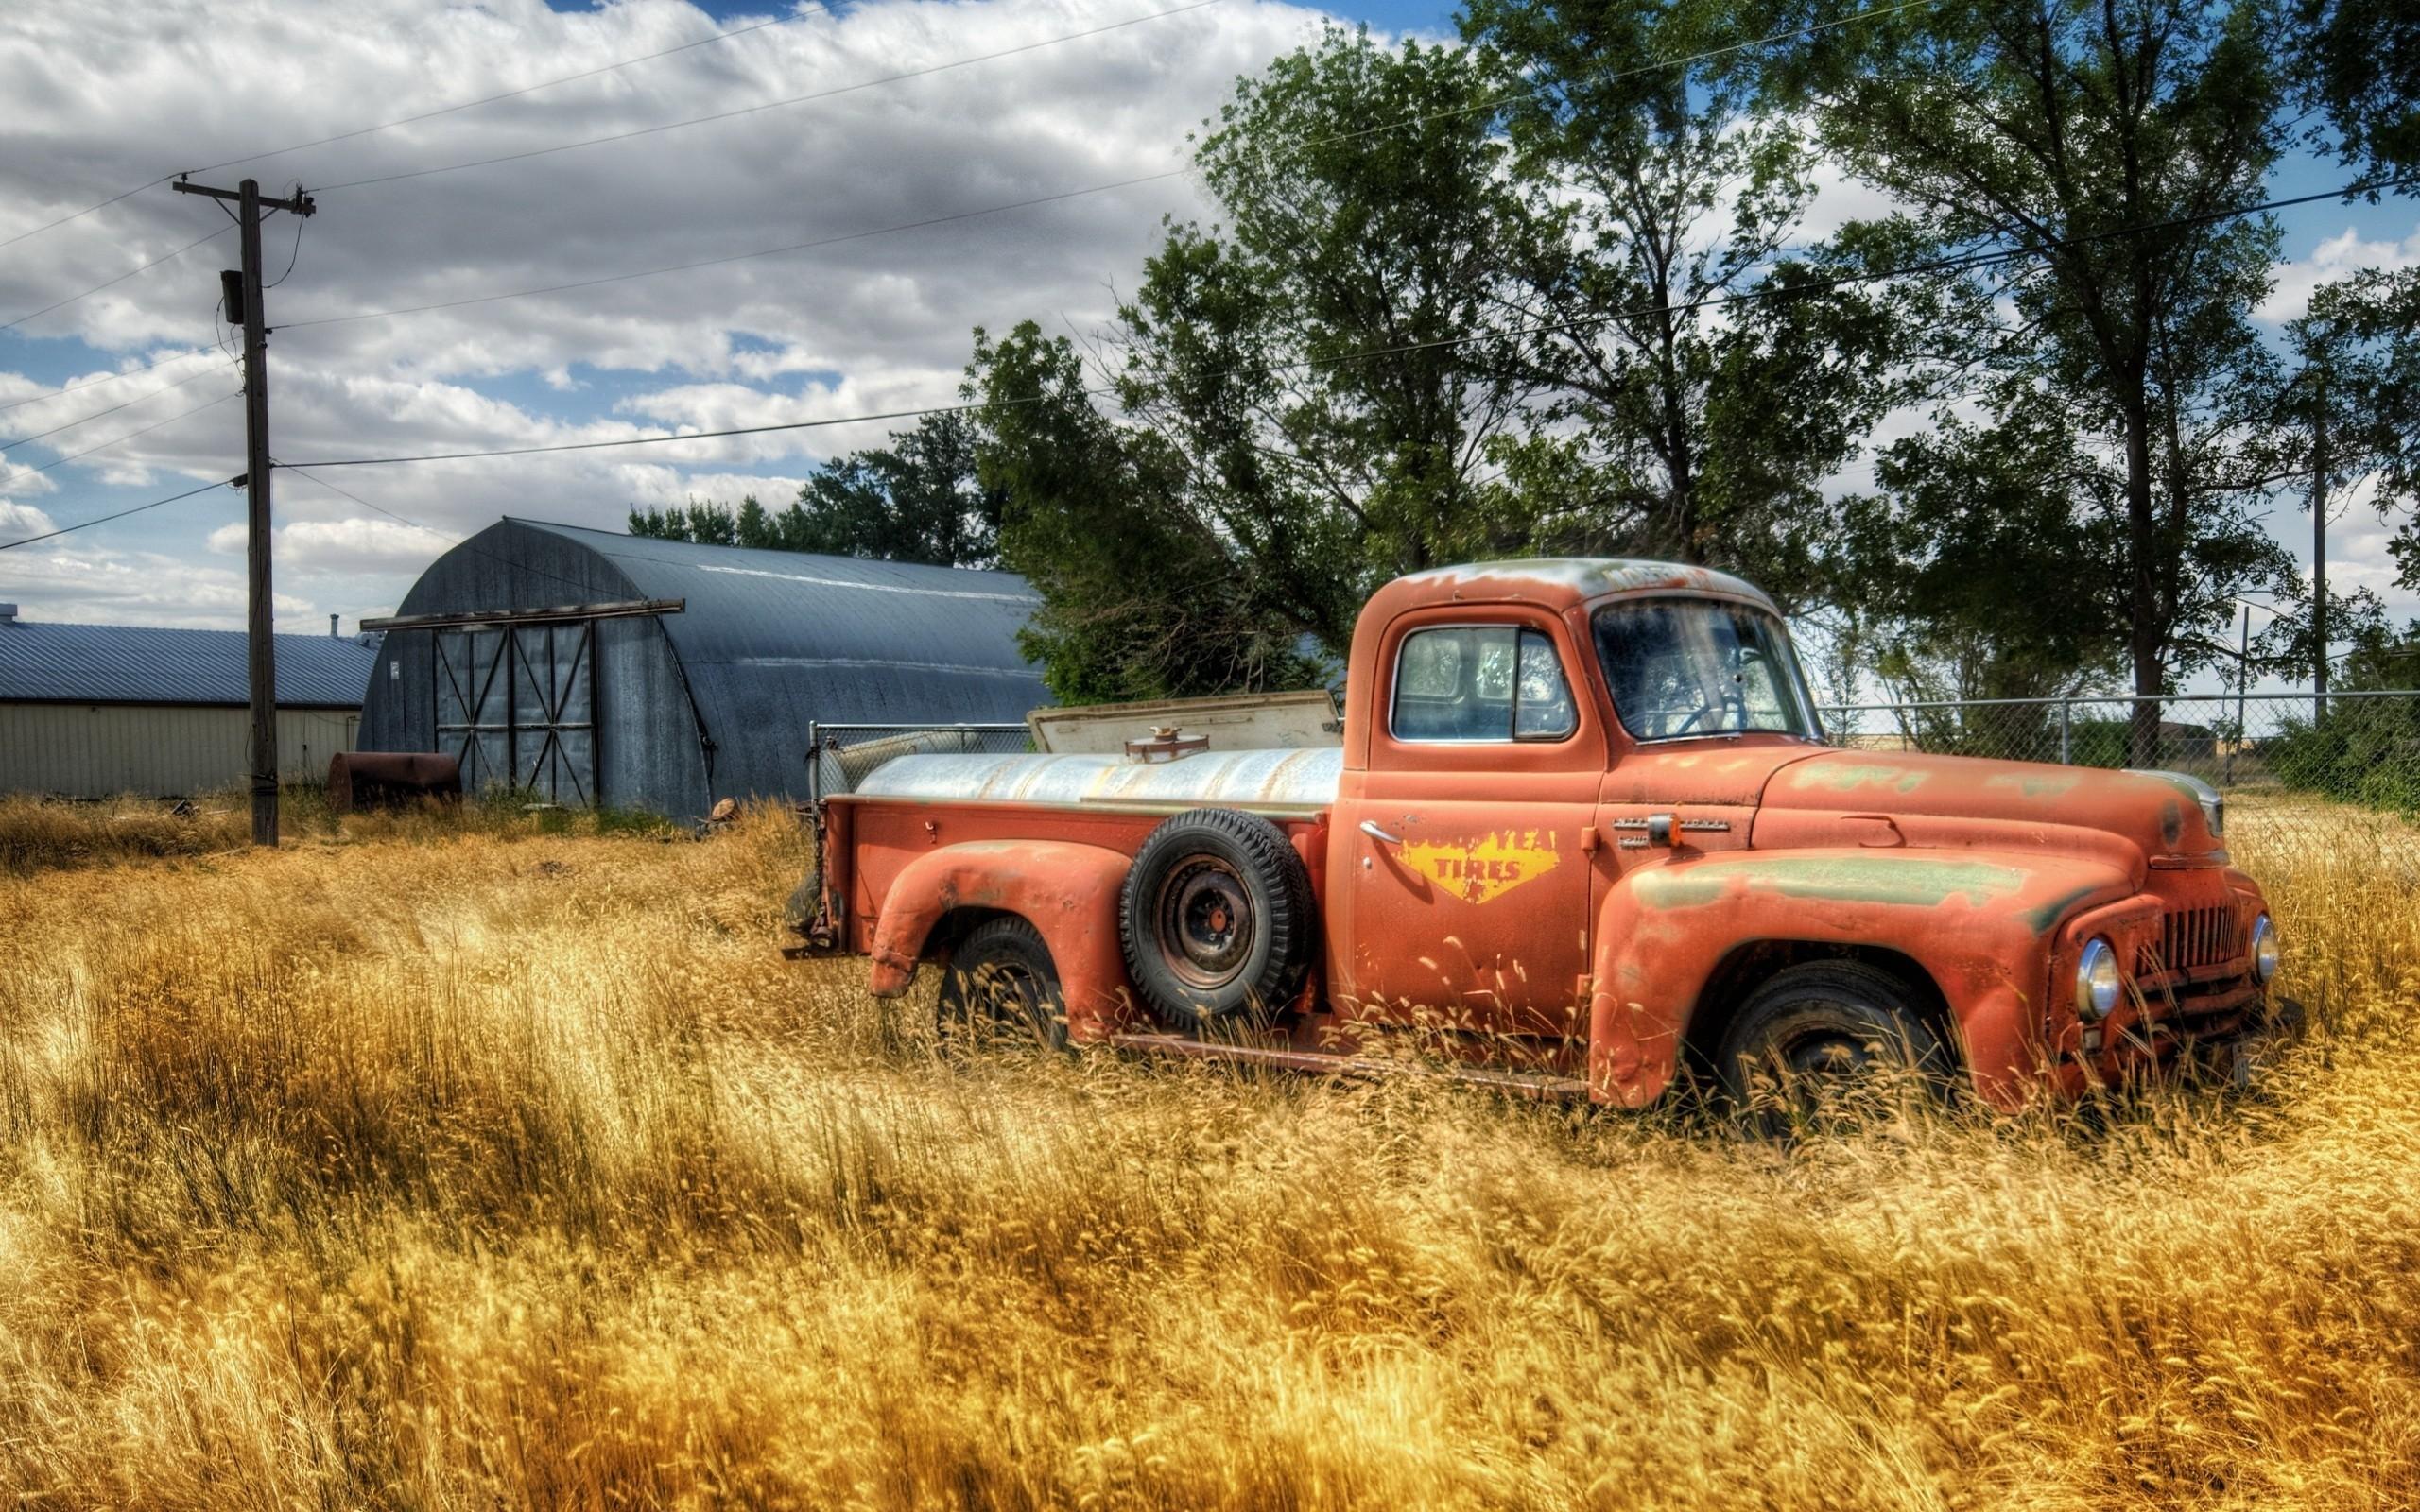 wallpaper.wiki-Images-Farming-2560×1600-PIC-WPB005450